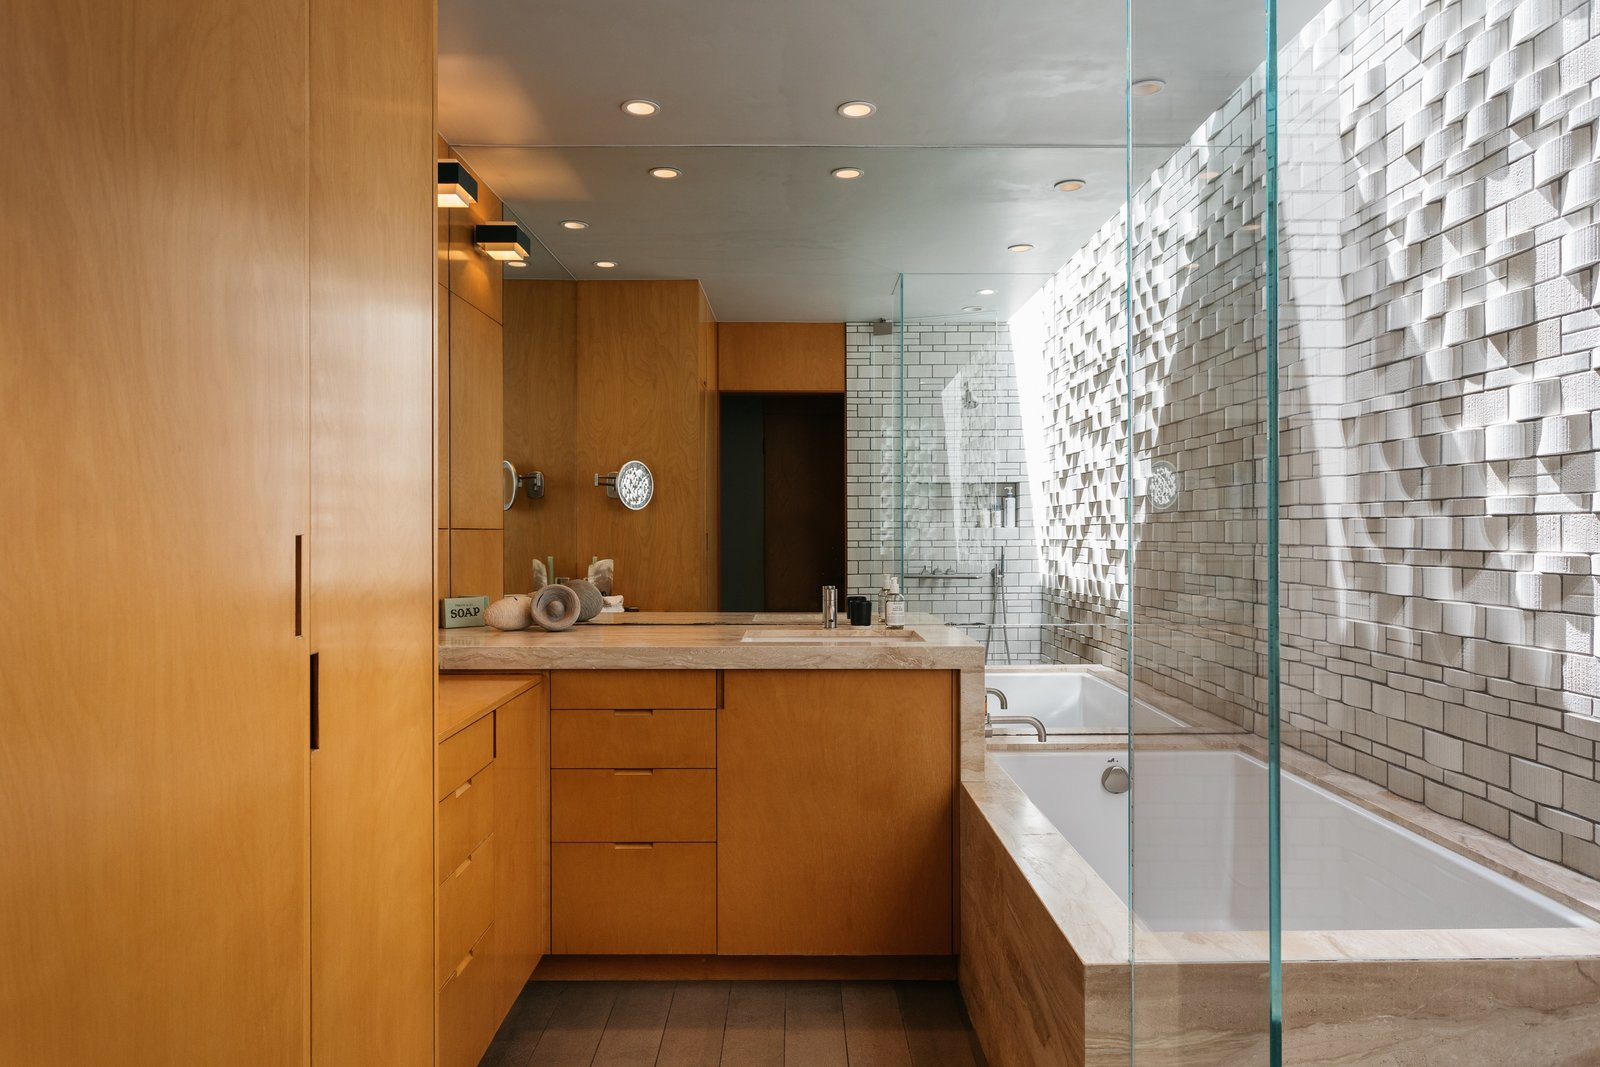 Richard Neutra Wilkins House Case Study House #13 master bath